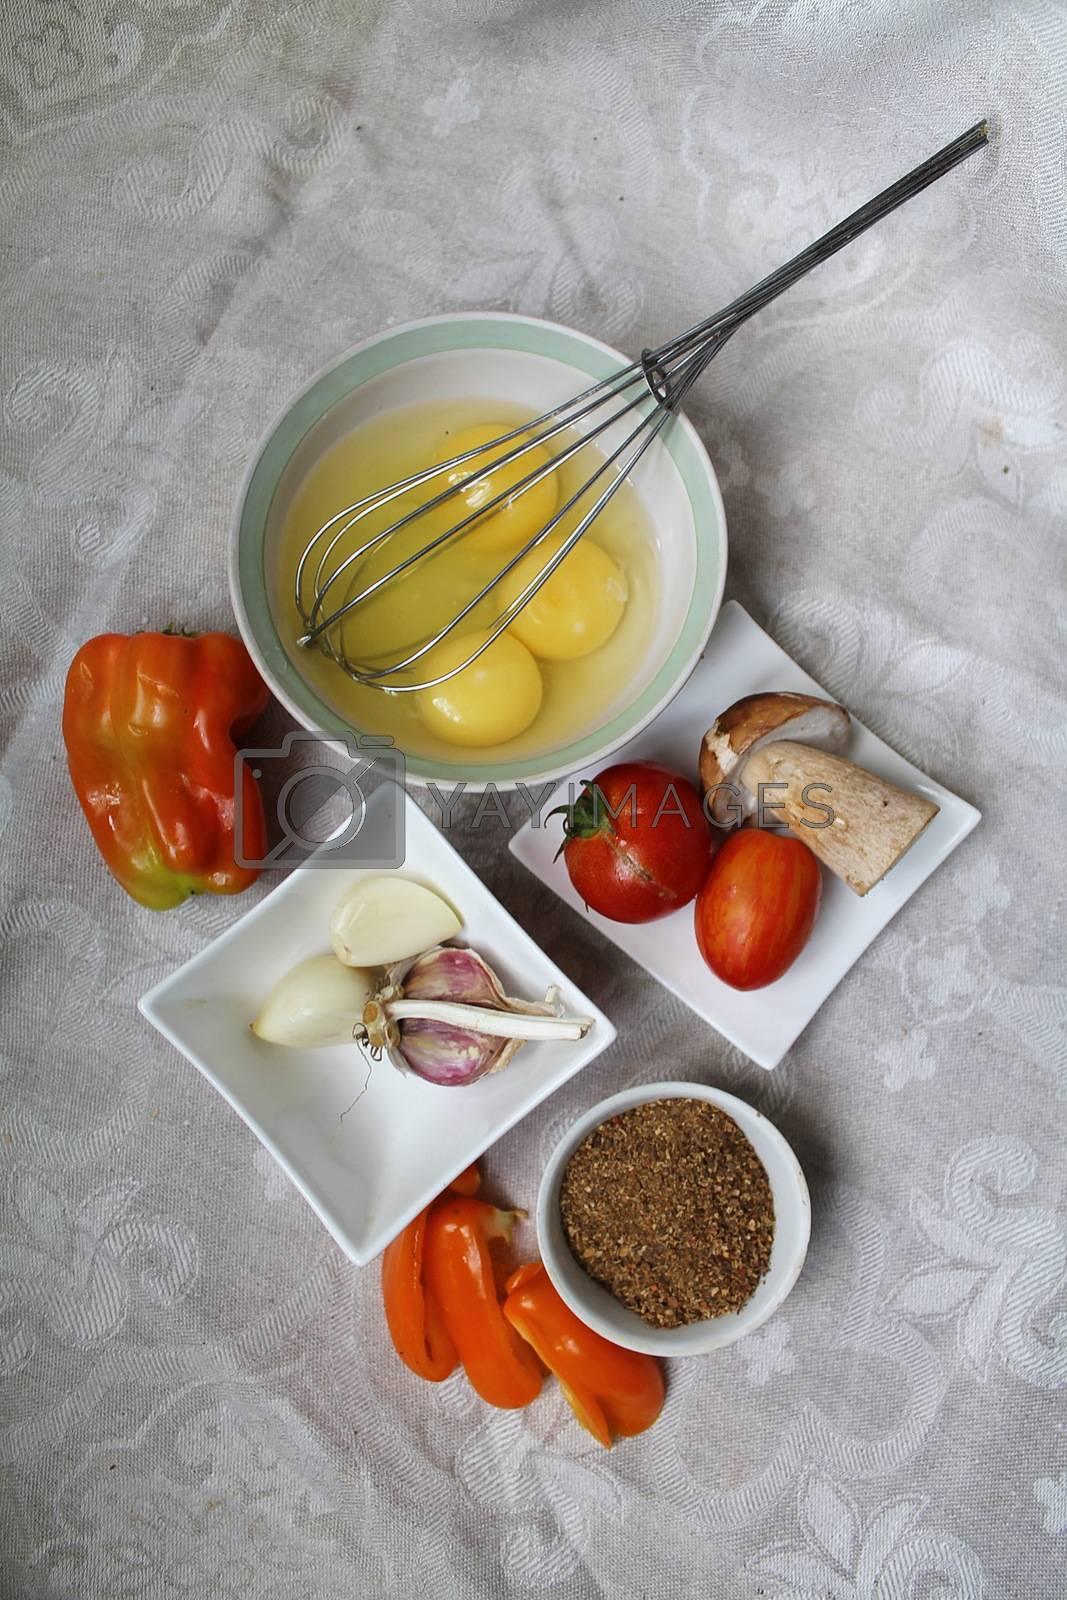 Royalty free image of Ingredients for breakfast by Niridaclam